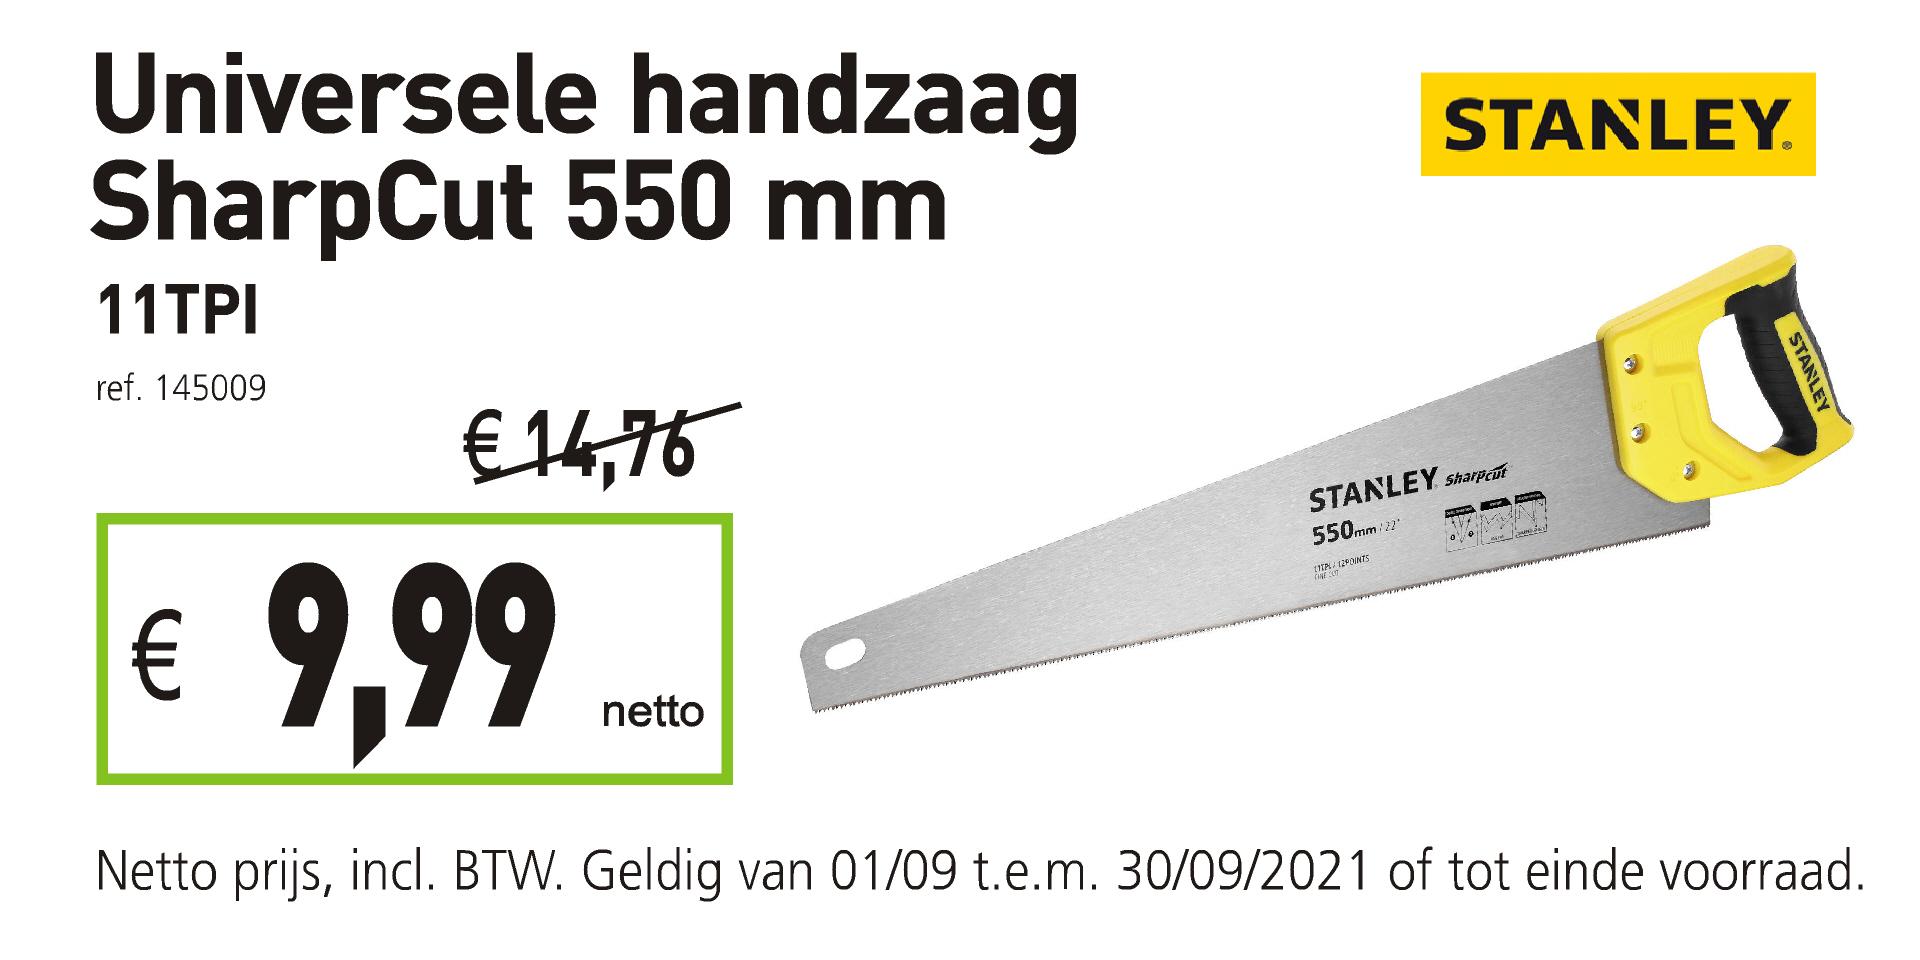 Stanley universele handzaag sharpcut 550 mm 11TPI